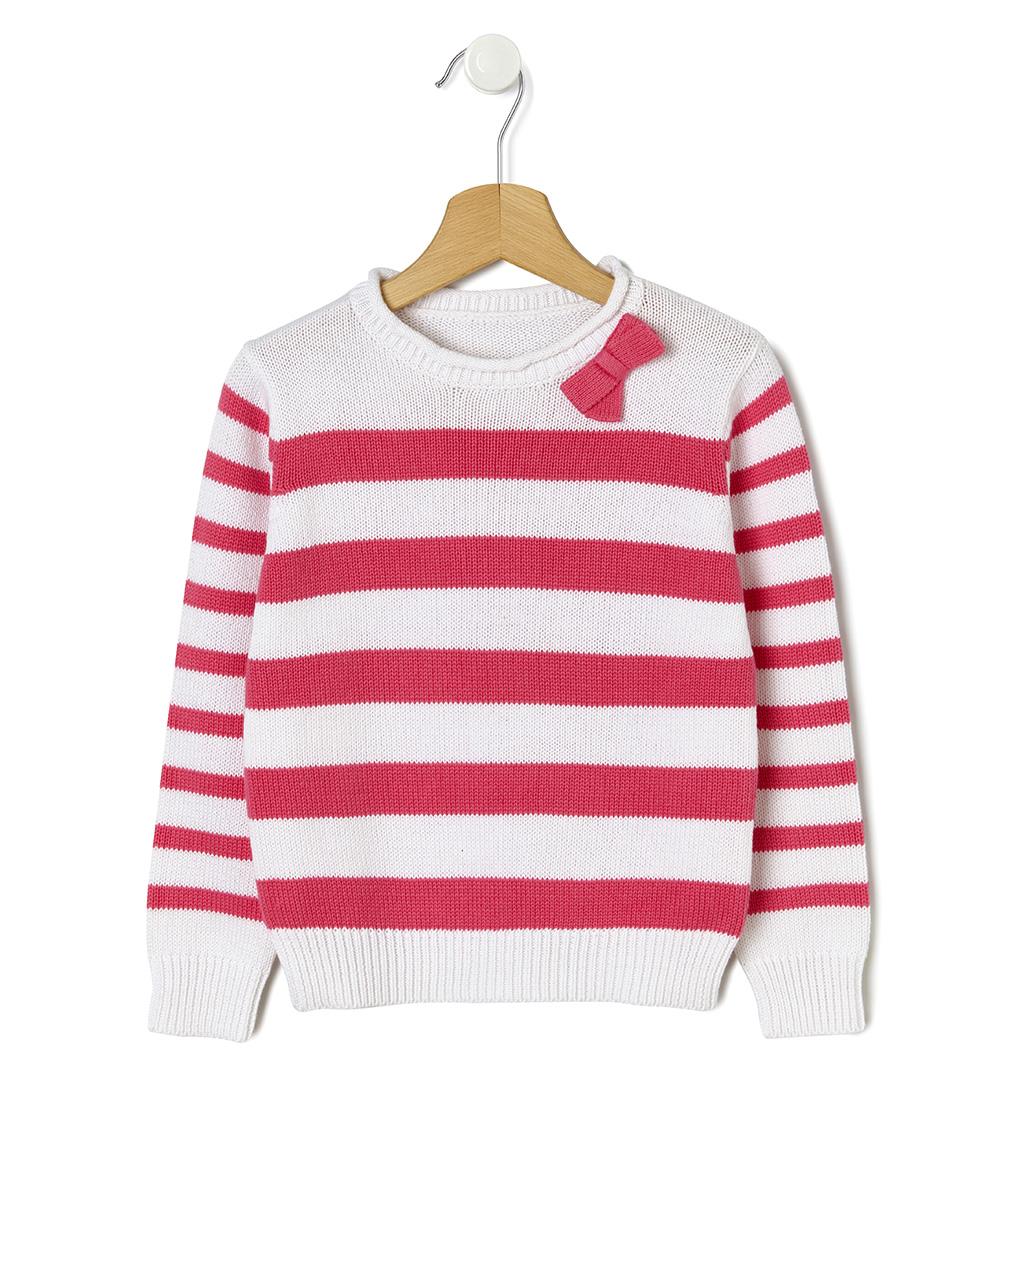 Maglia basica tricot a righe - Prénatal